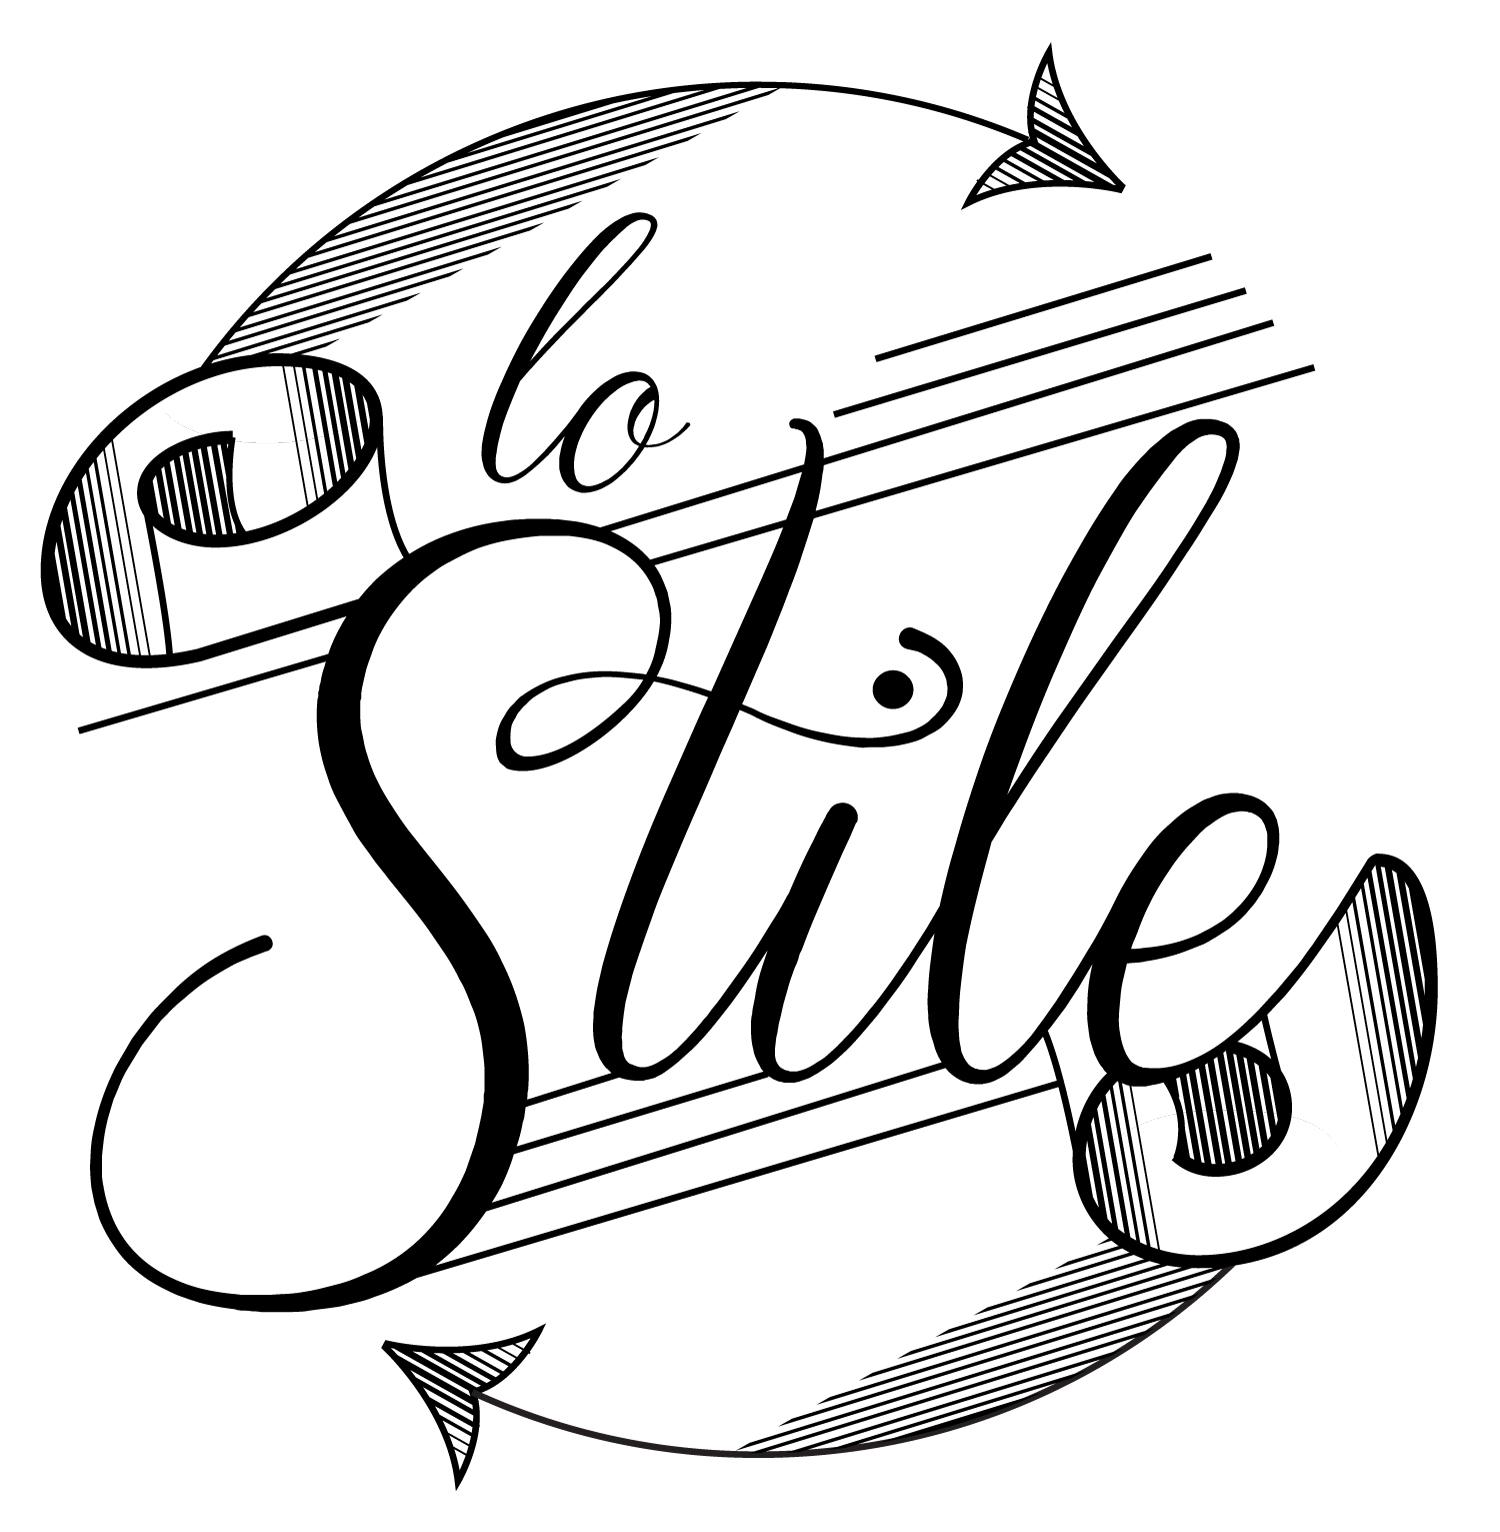 lostile_ducato_brand.jpg